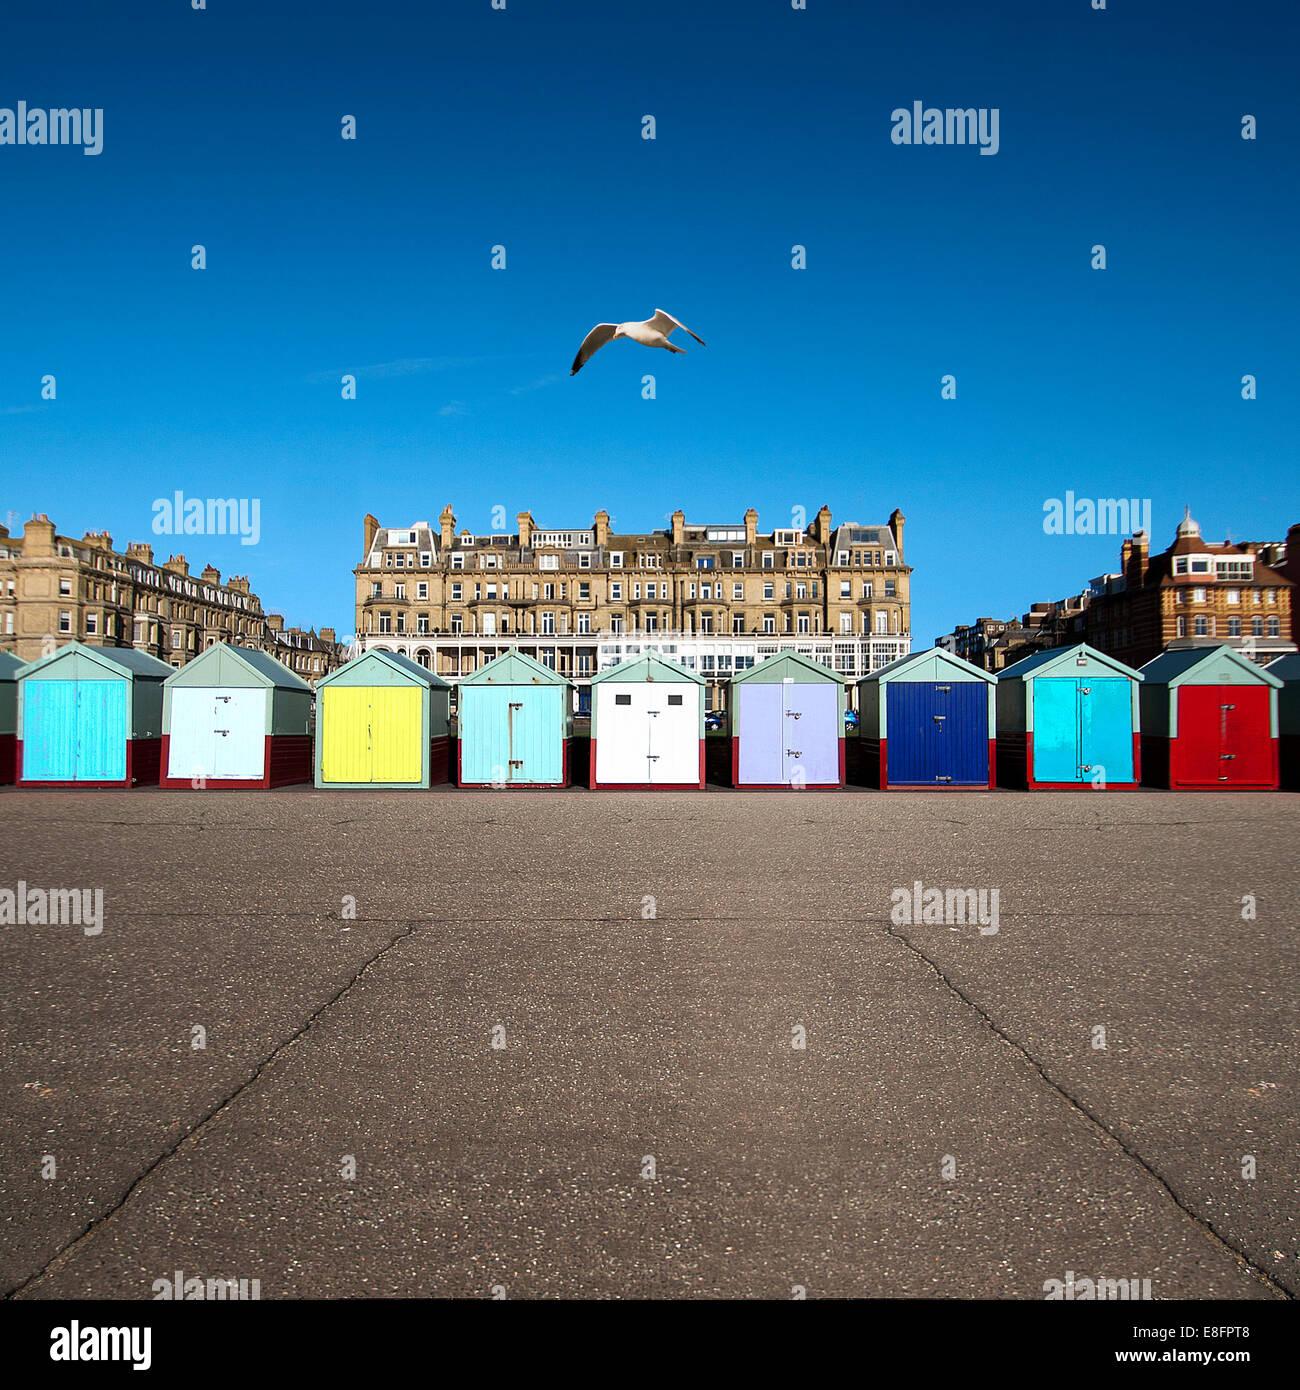 Multi-colored row of beach huts, Brighton, England, UK - Stock Image